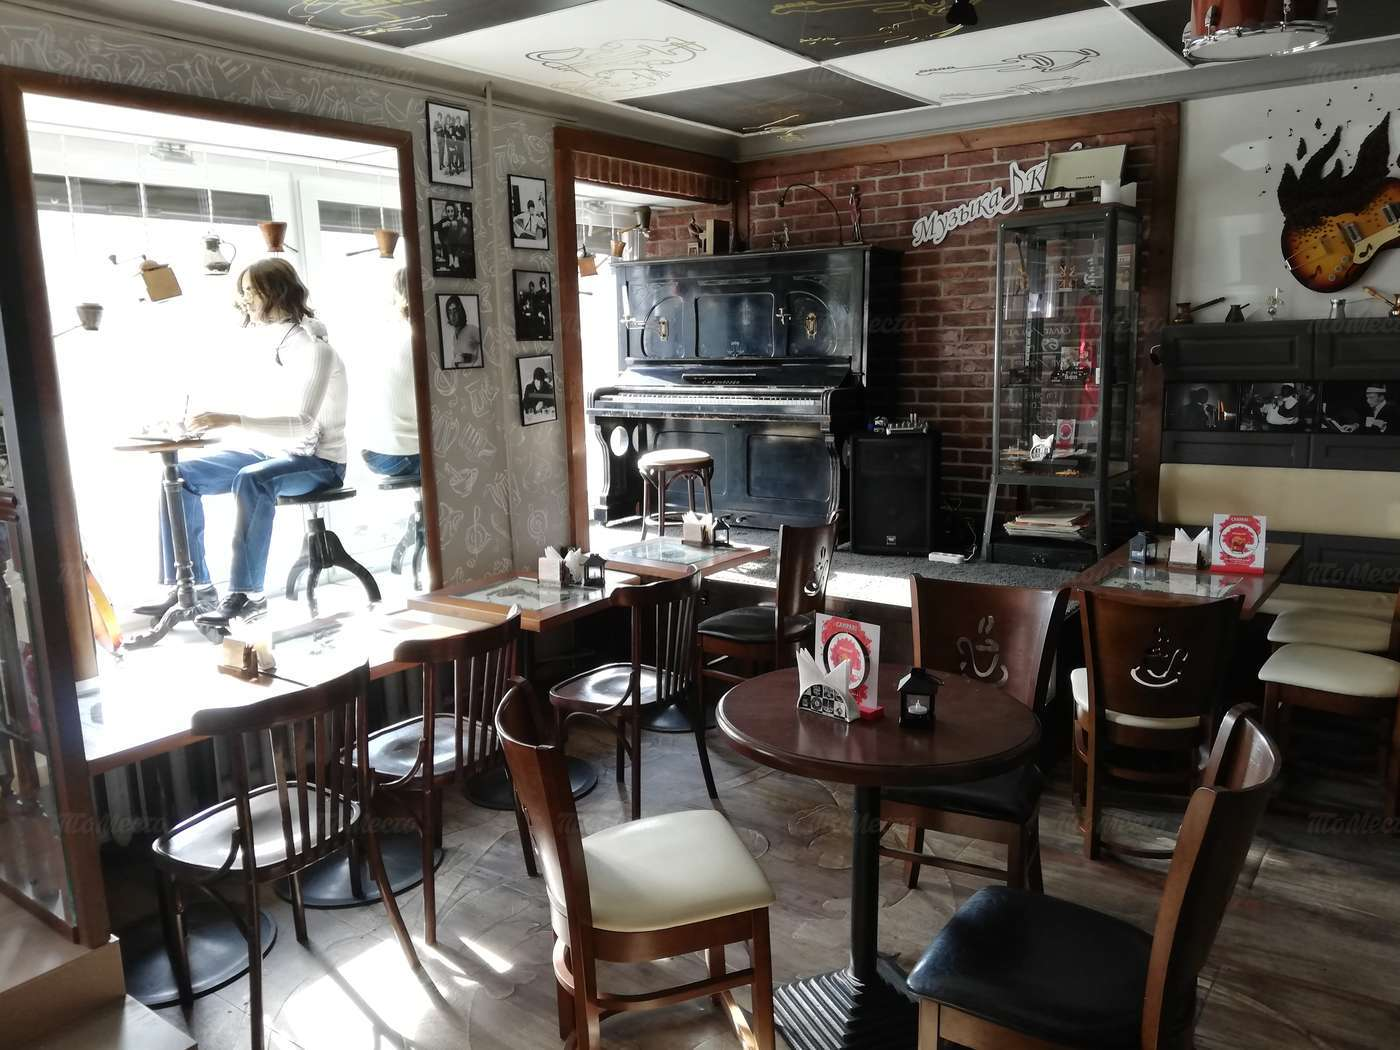 Кафе Музыка кофе на набережной реки Фонтанки фото 7